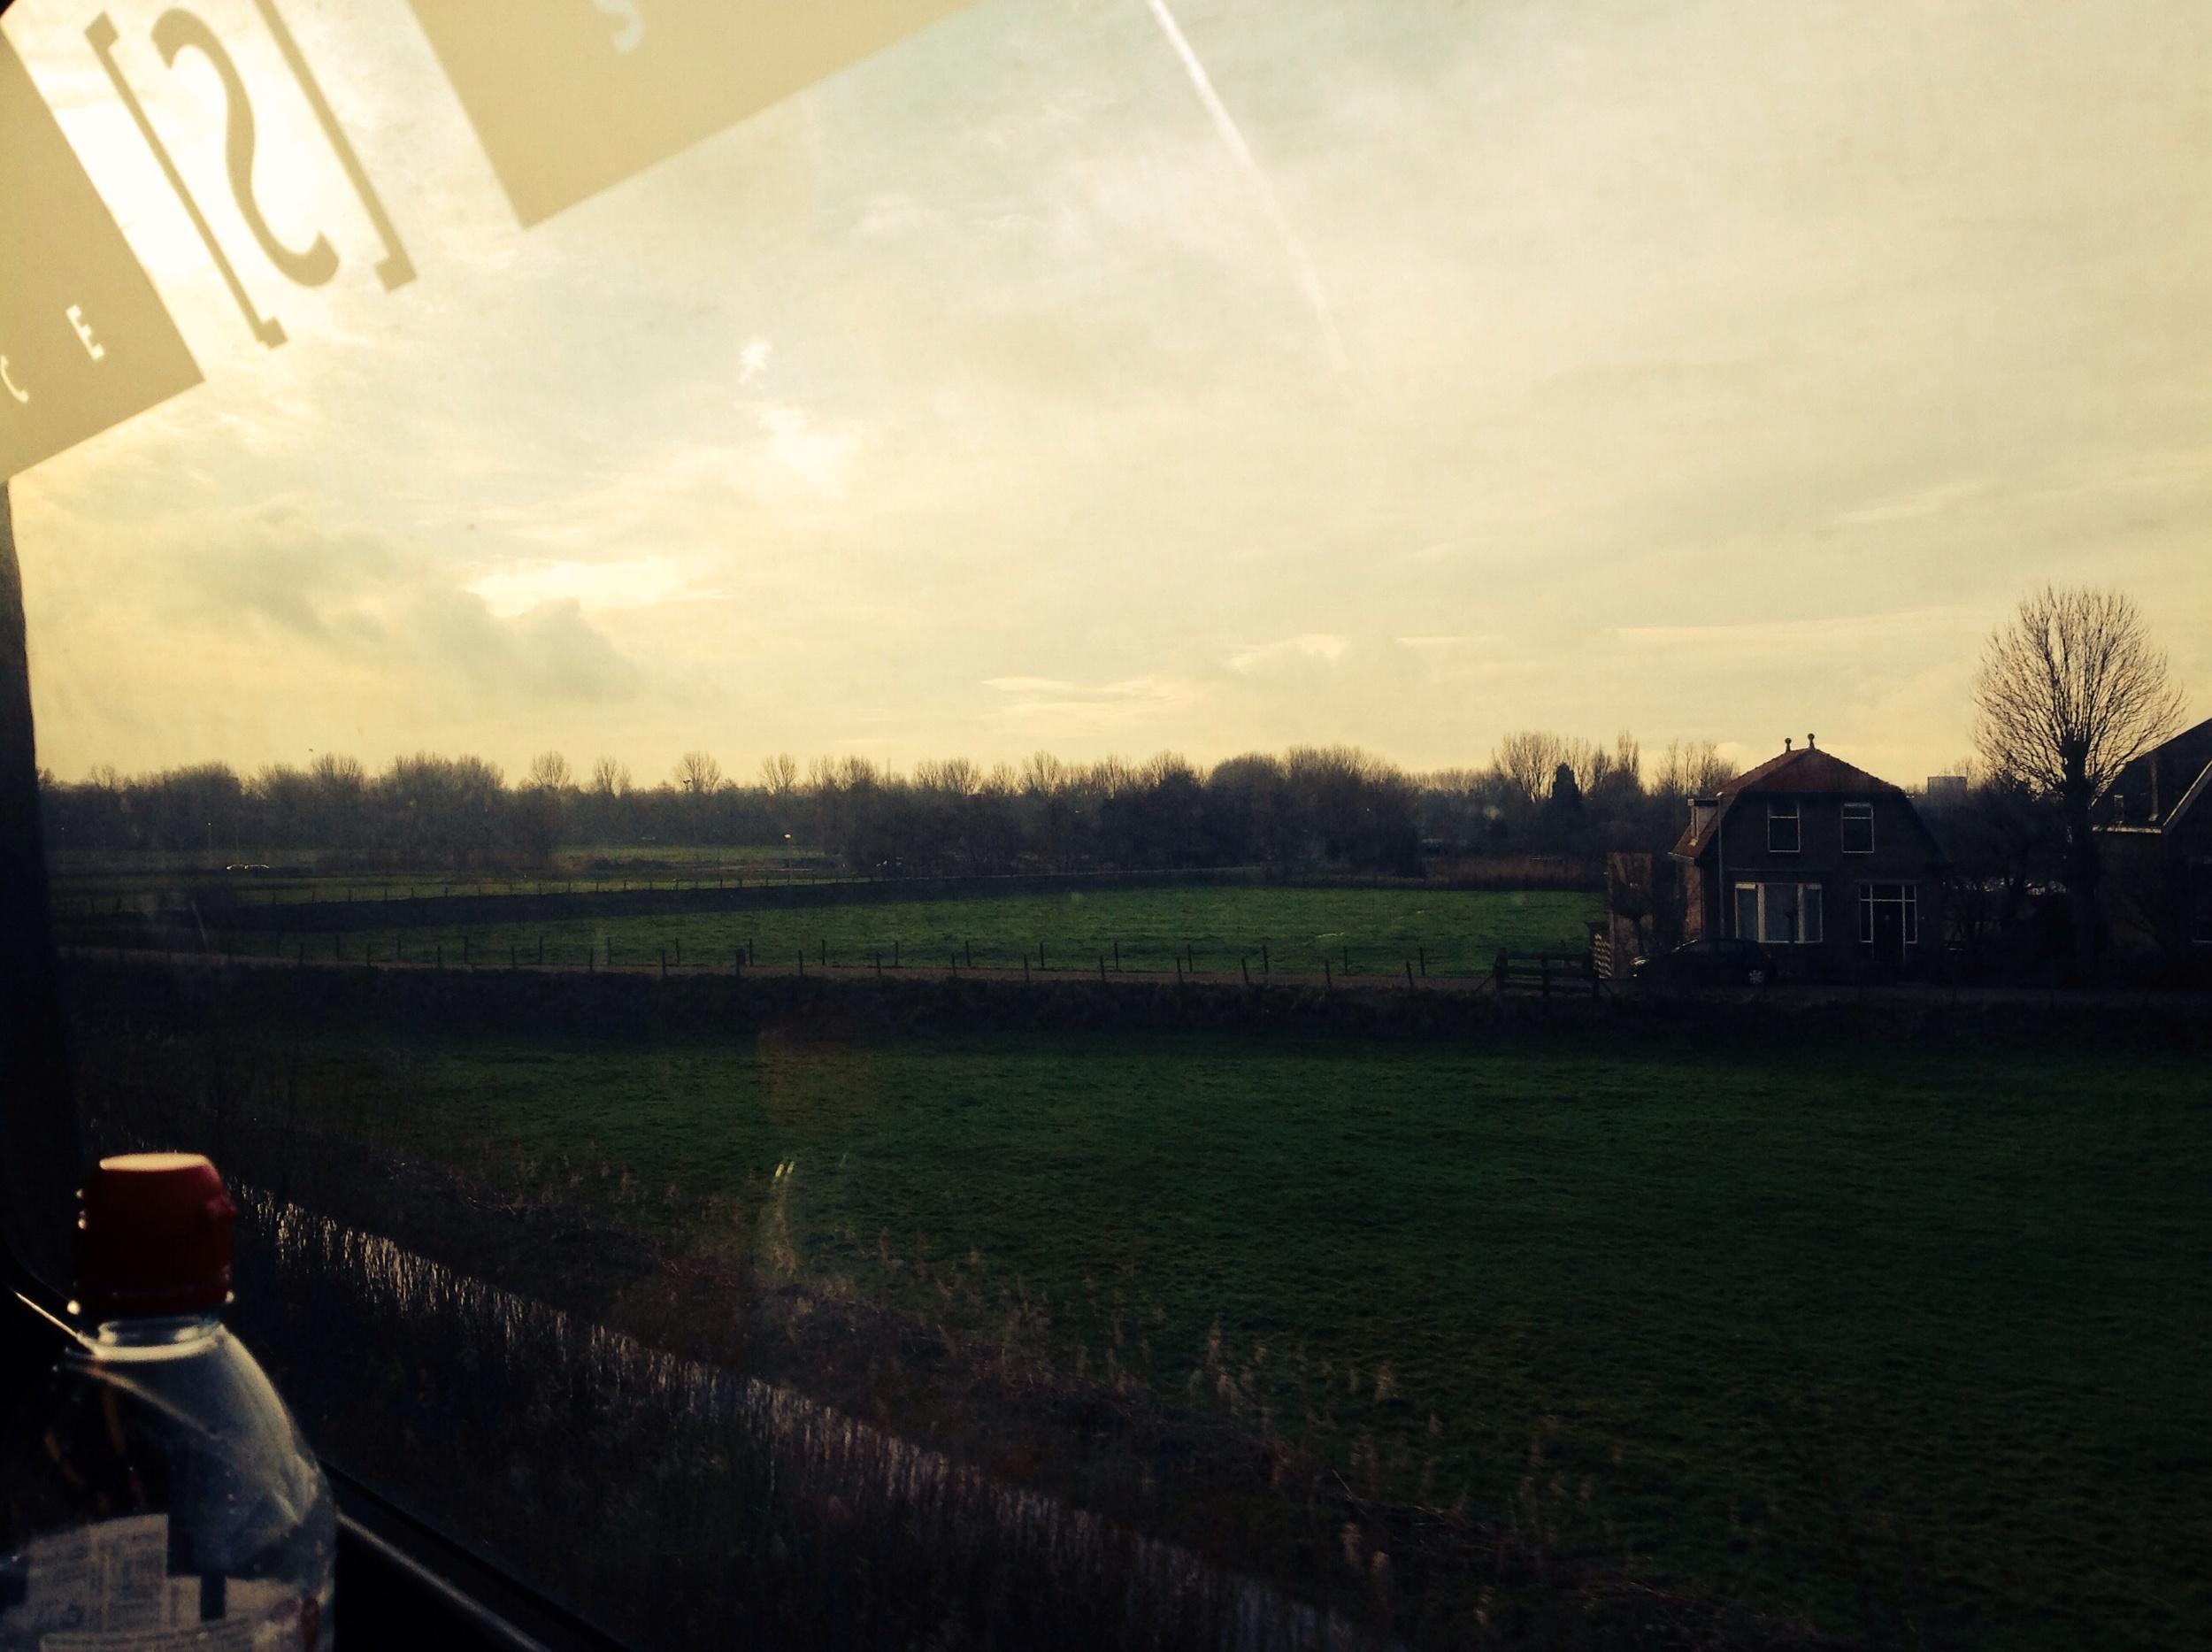 Passing through Nederland